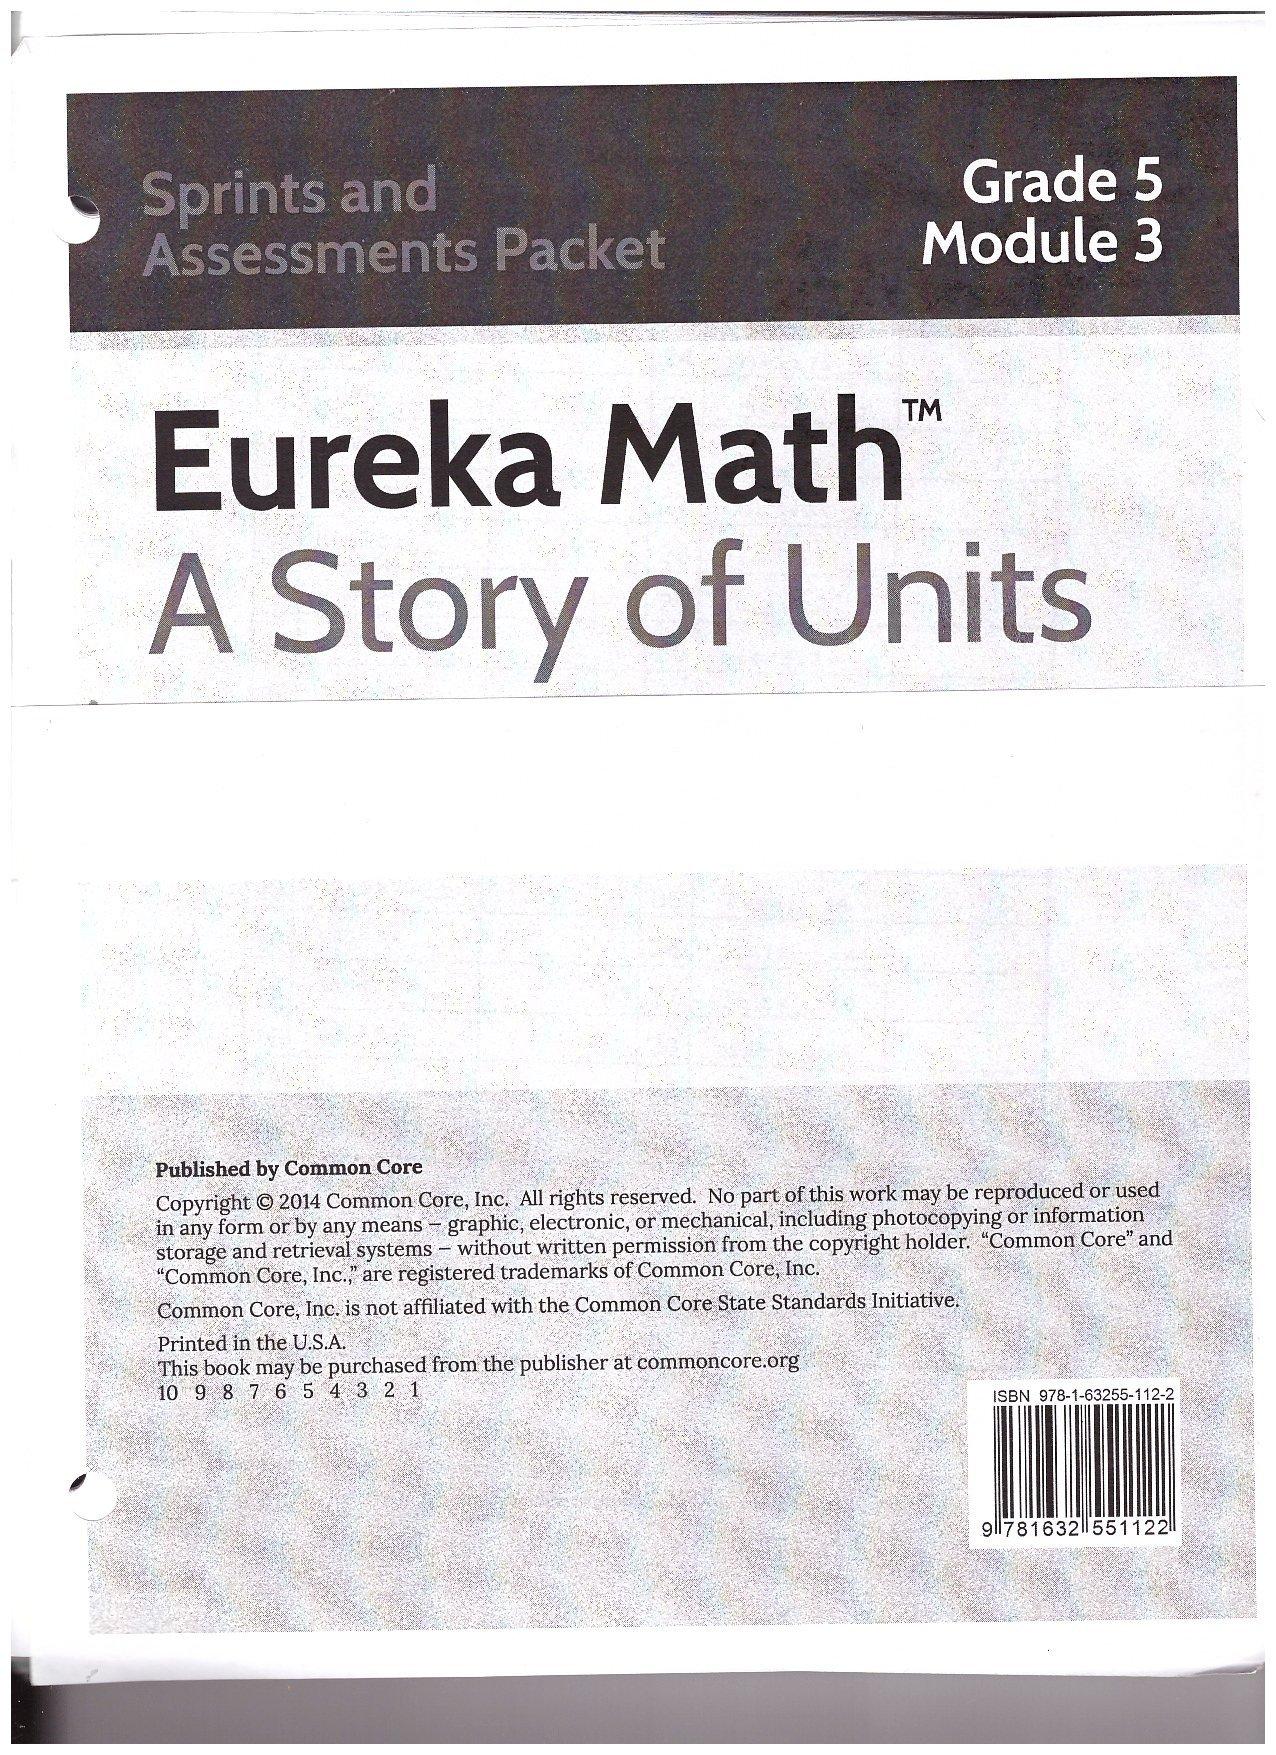 Eureka Math A Story of Units Grade 5 Module 3 Sprints and ...